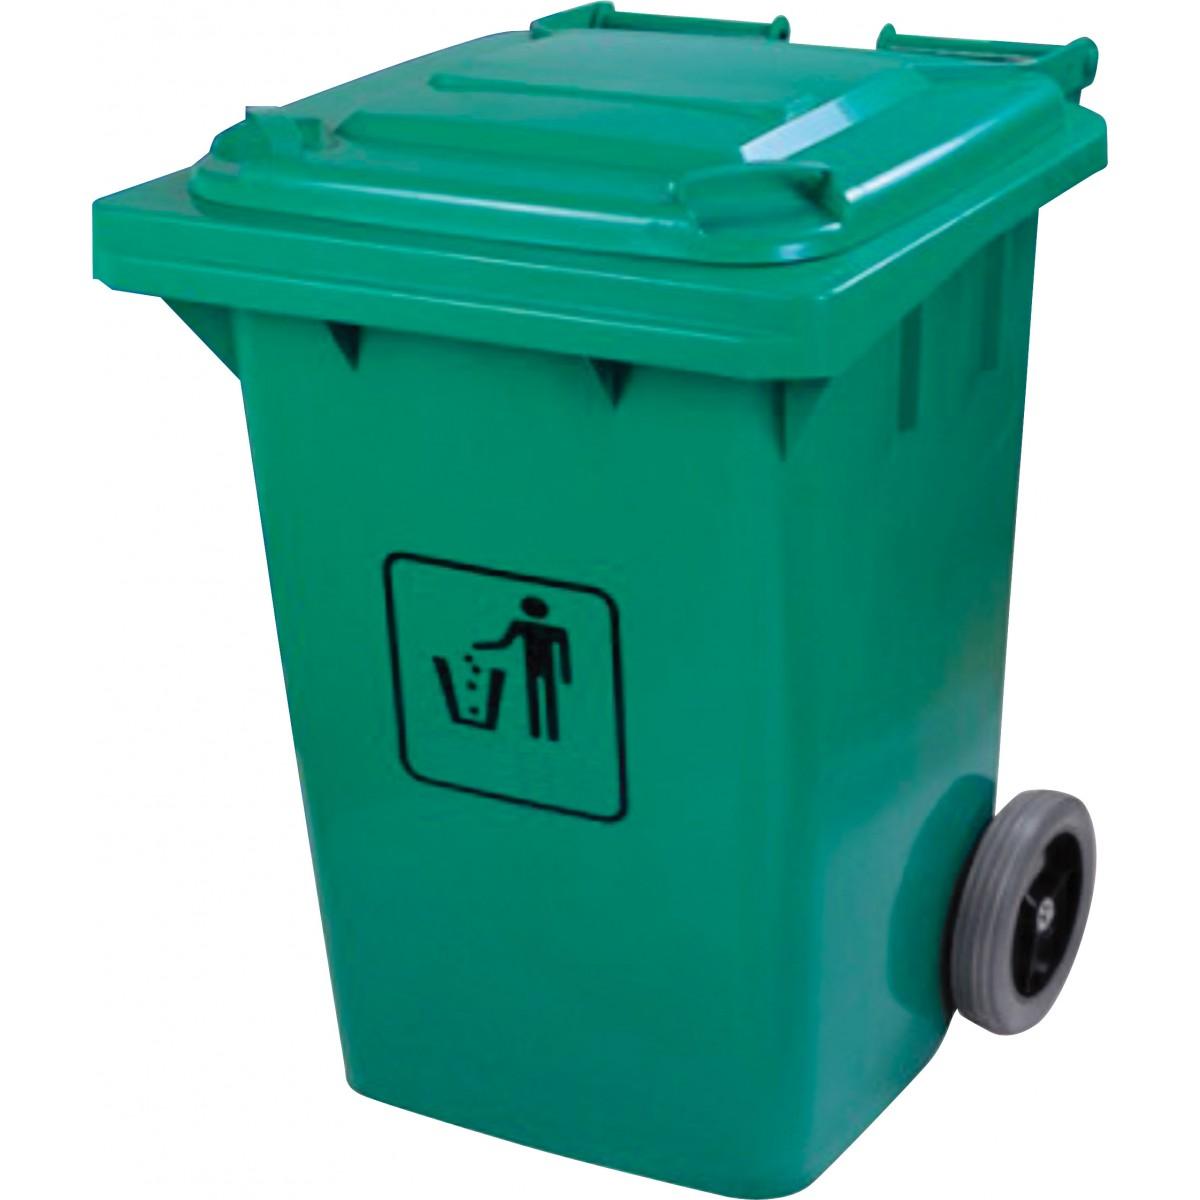 Trash Garbage Can Bin With Lid On Wheels 63 4 Gal 240